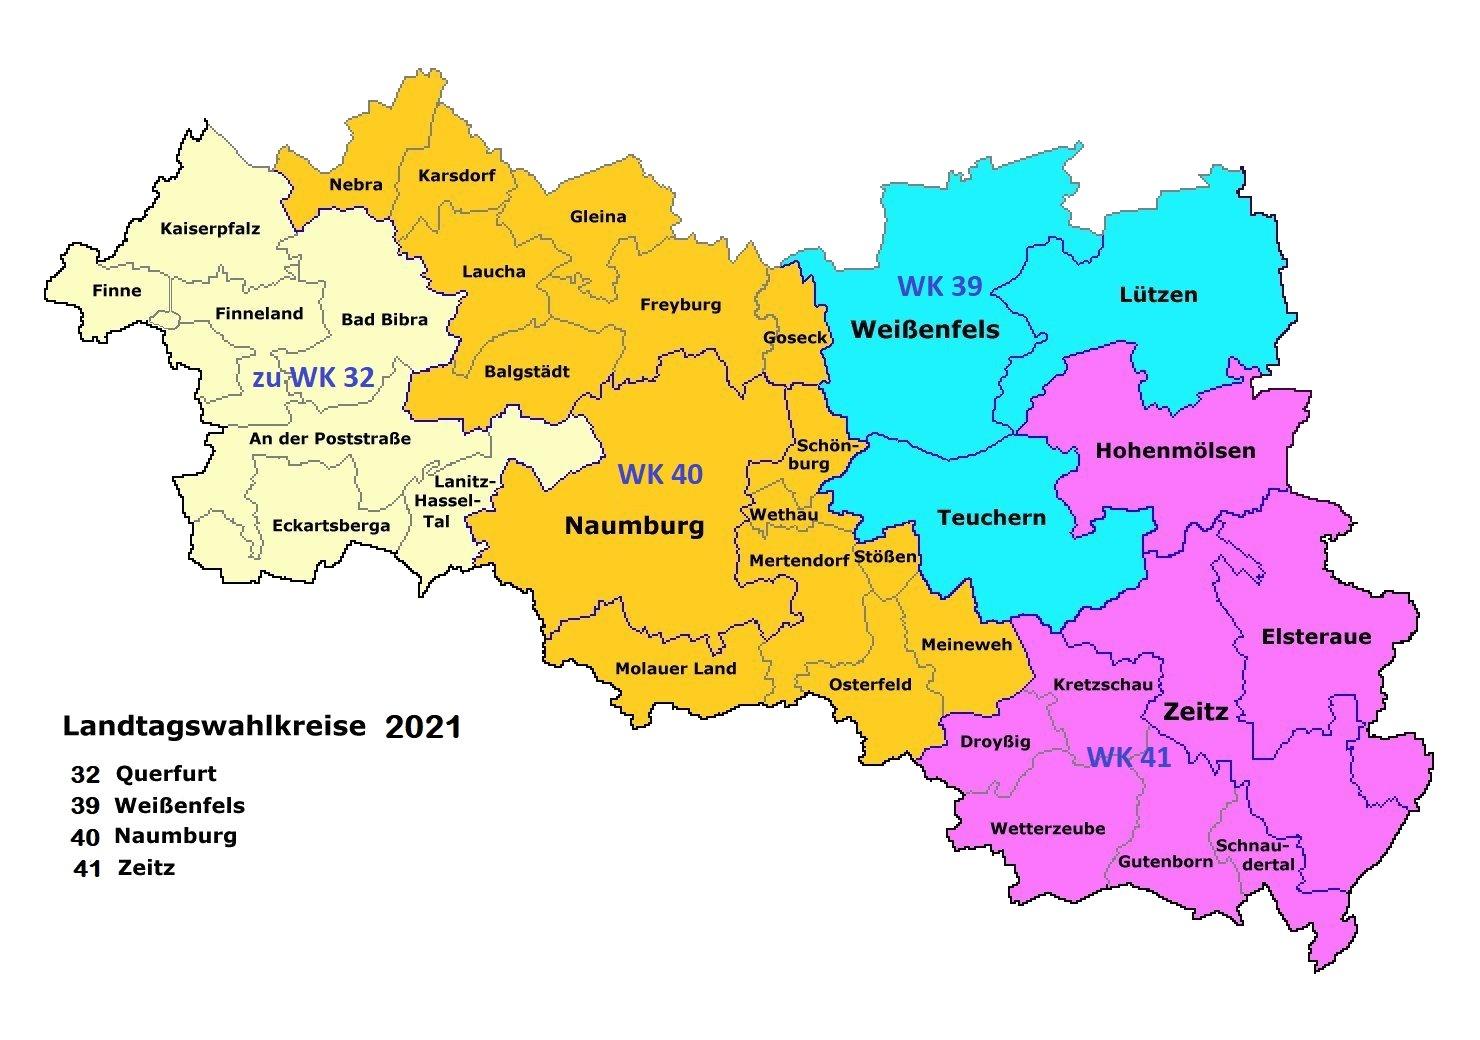 kreiskarte landtagswahl 2021 wahlkreise